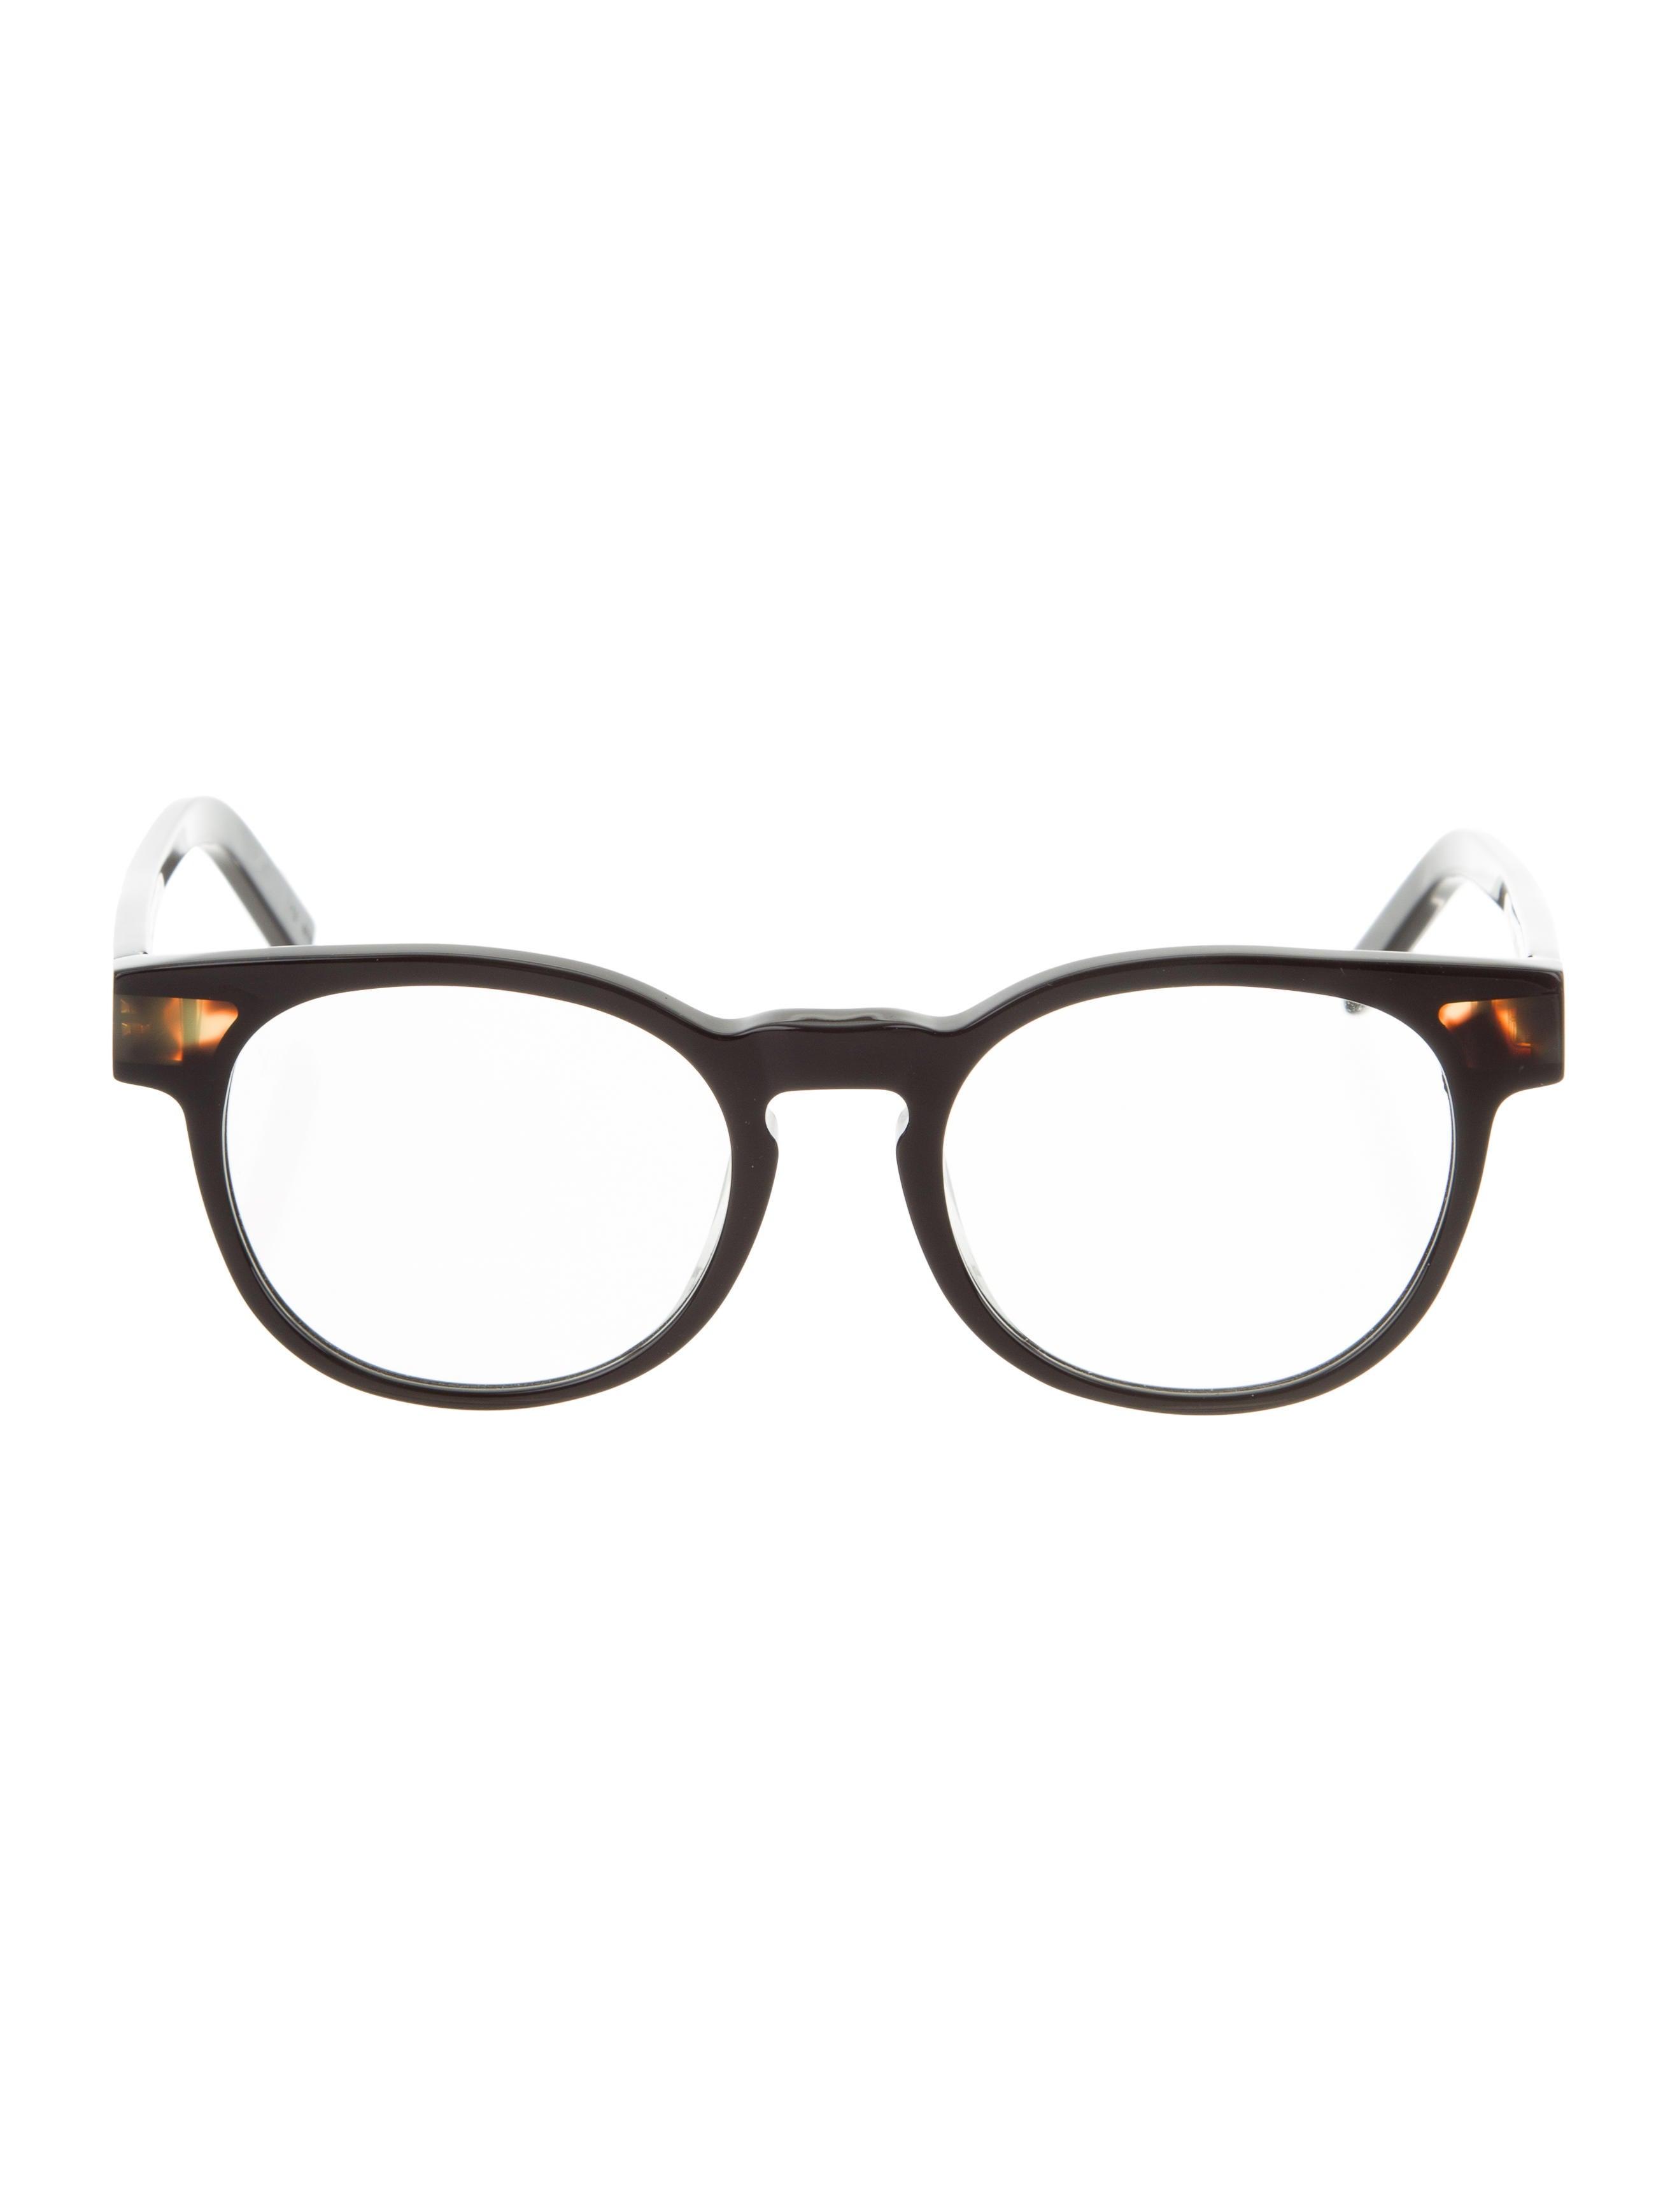 8a4e3a8867 Louis Vuitton 2018 Jungle Sunglasses w  Tags - Accessories ...